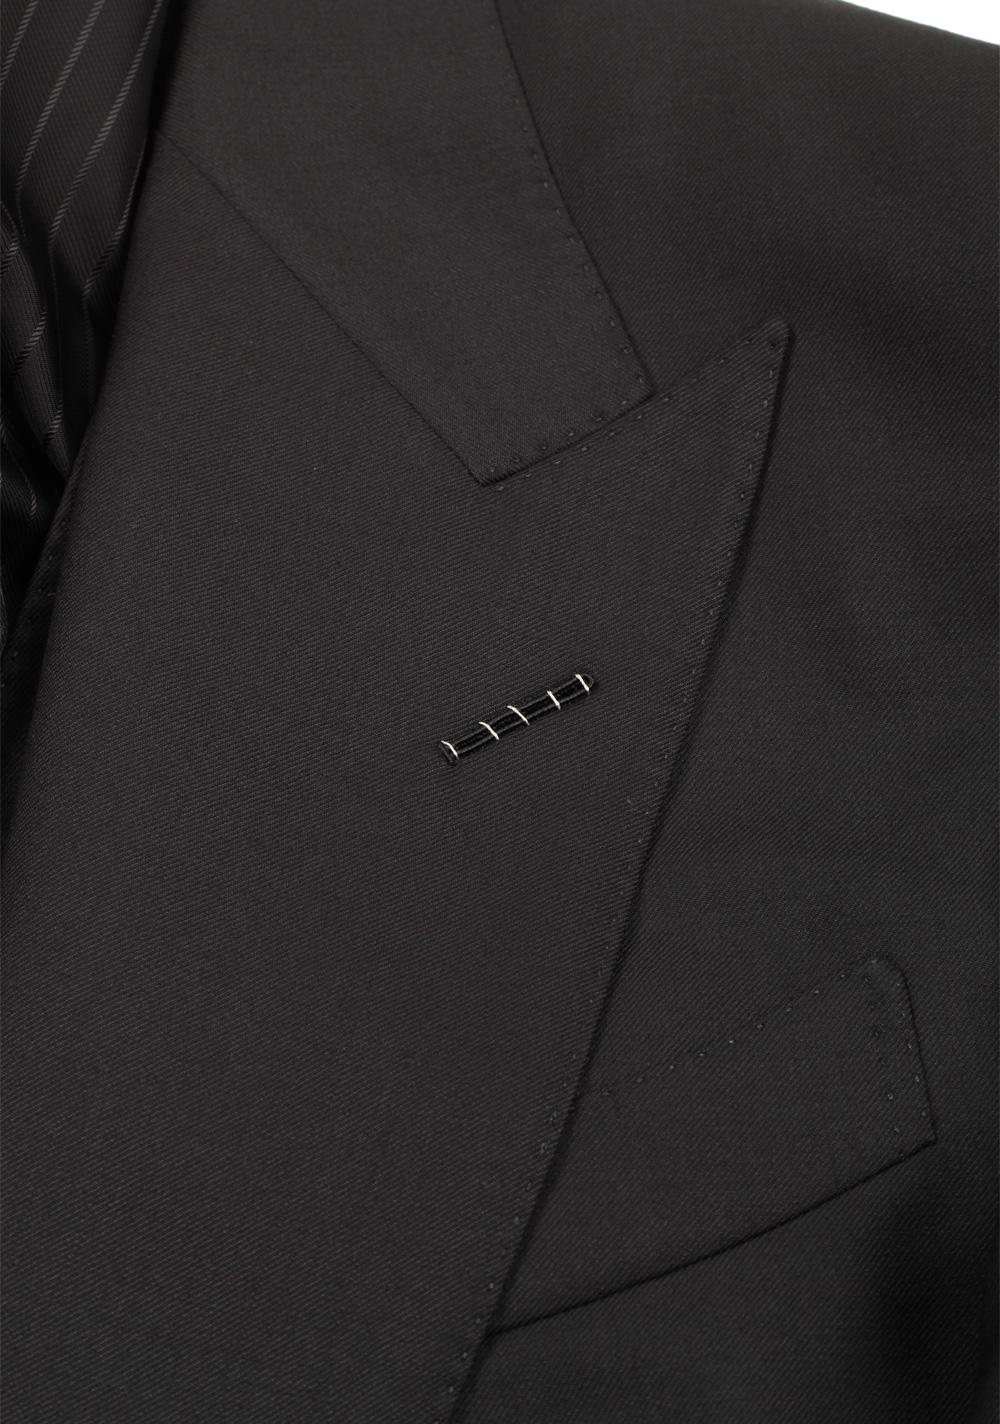 TOM FORD Windsor Black 3 Piece Suit Size 52 / 42R U.S. Wool | Costume Limité